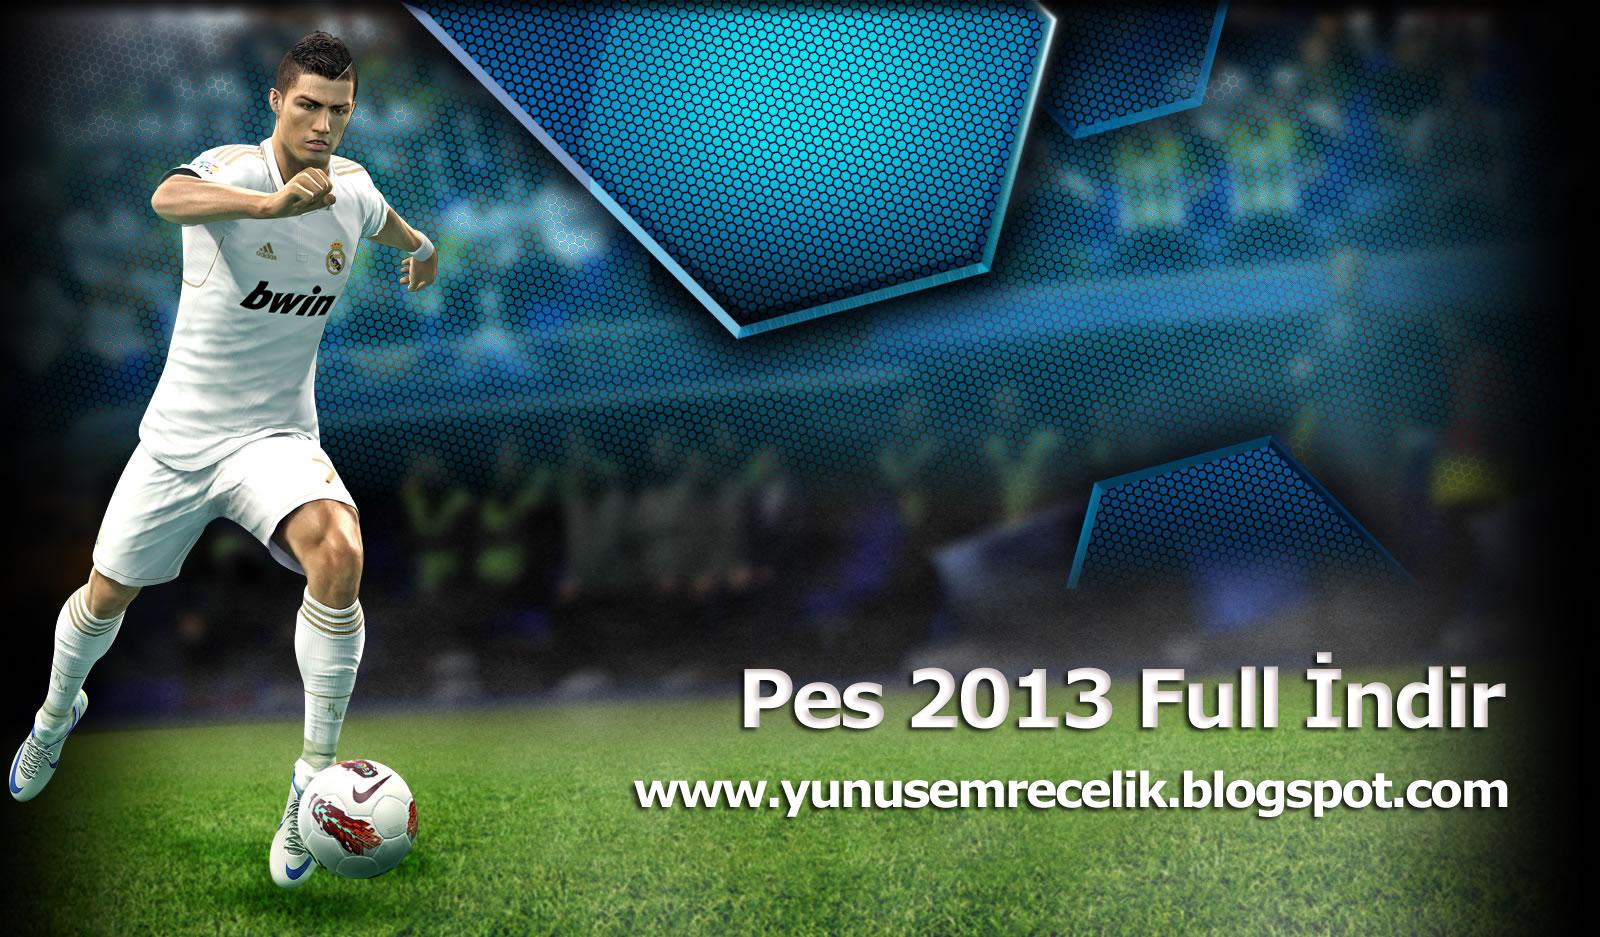 Pes 2013 Full İndir - Torrent İndir